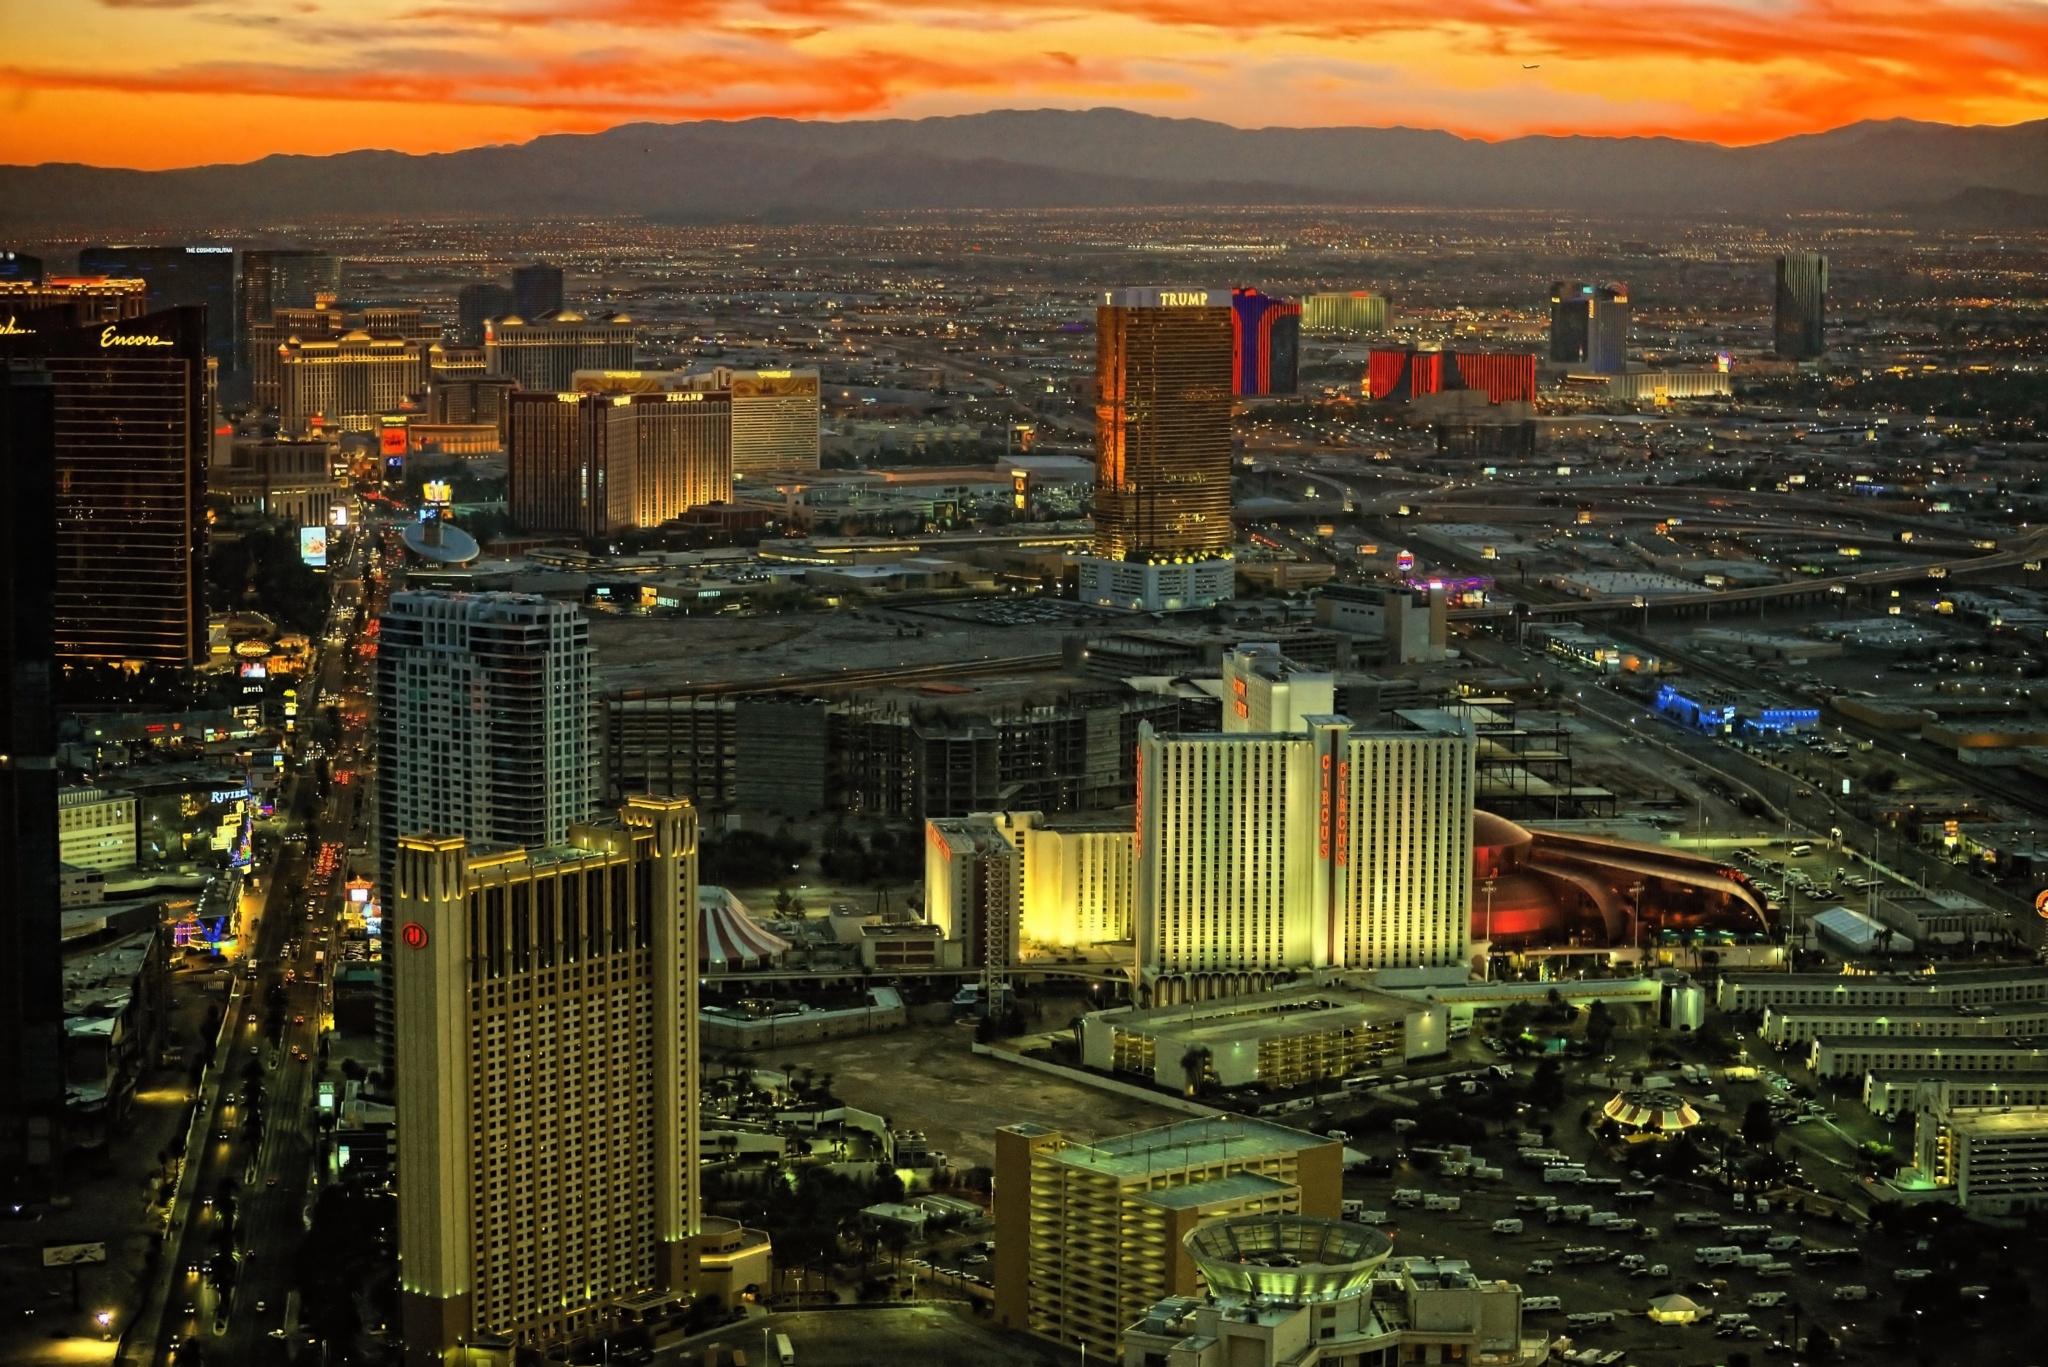 Las Vegas, Nevada by Nelson Sibulo